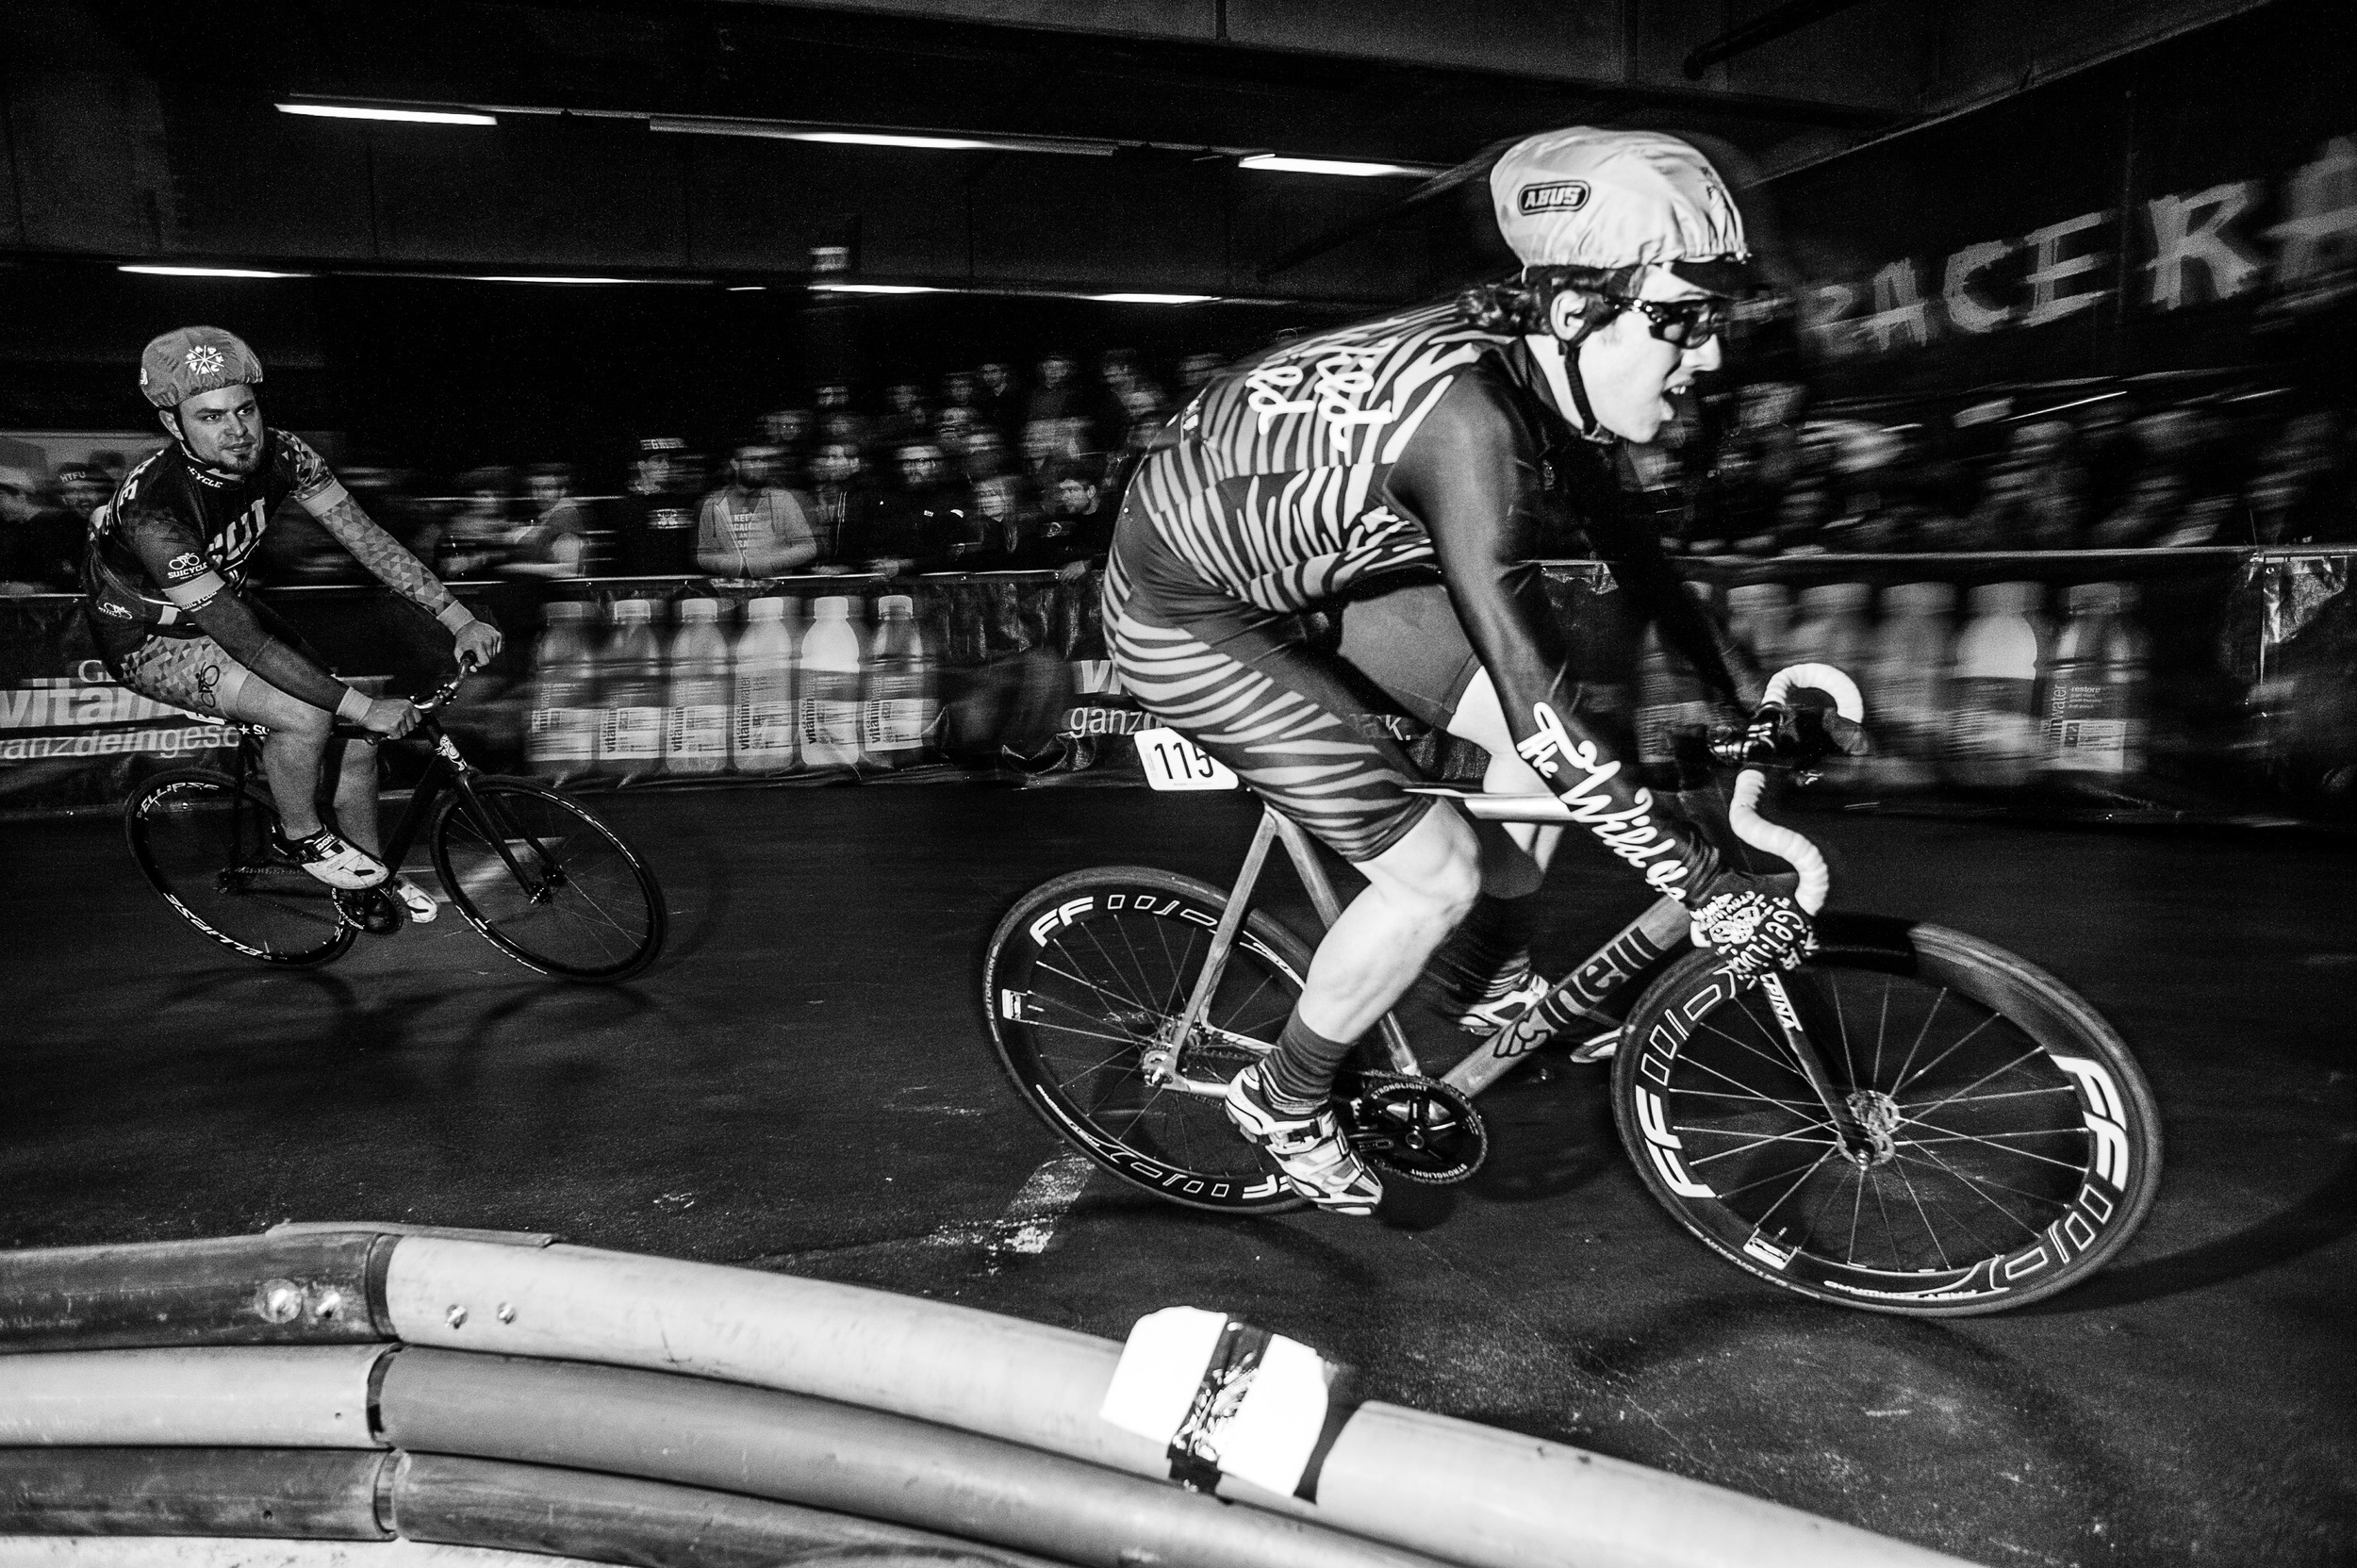 RAD RACE Last Man Standing, Berlin March 19 2016 - Shot by Drew Kaplan 34.jpg